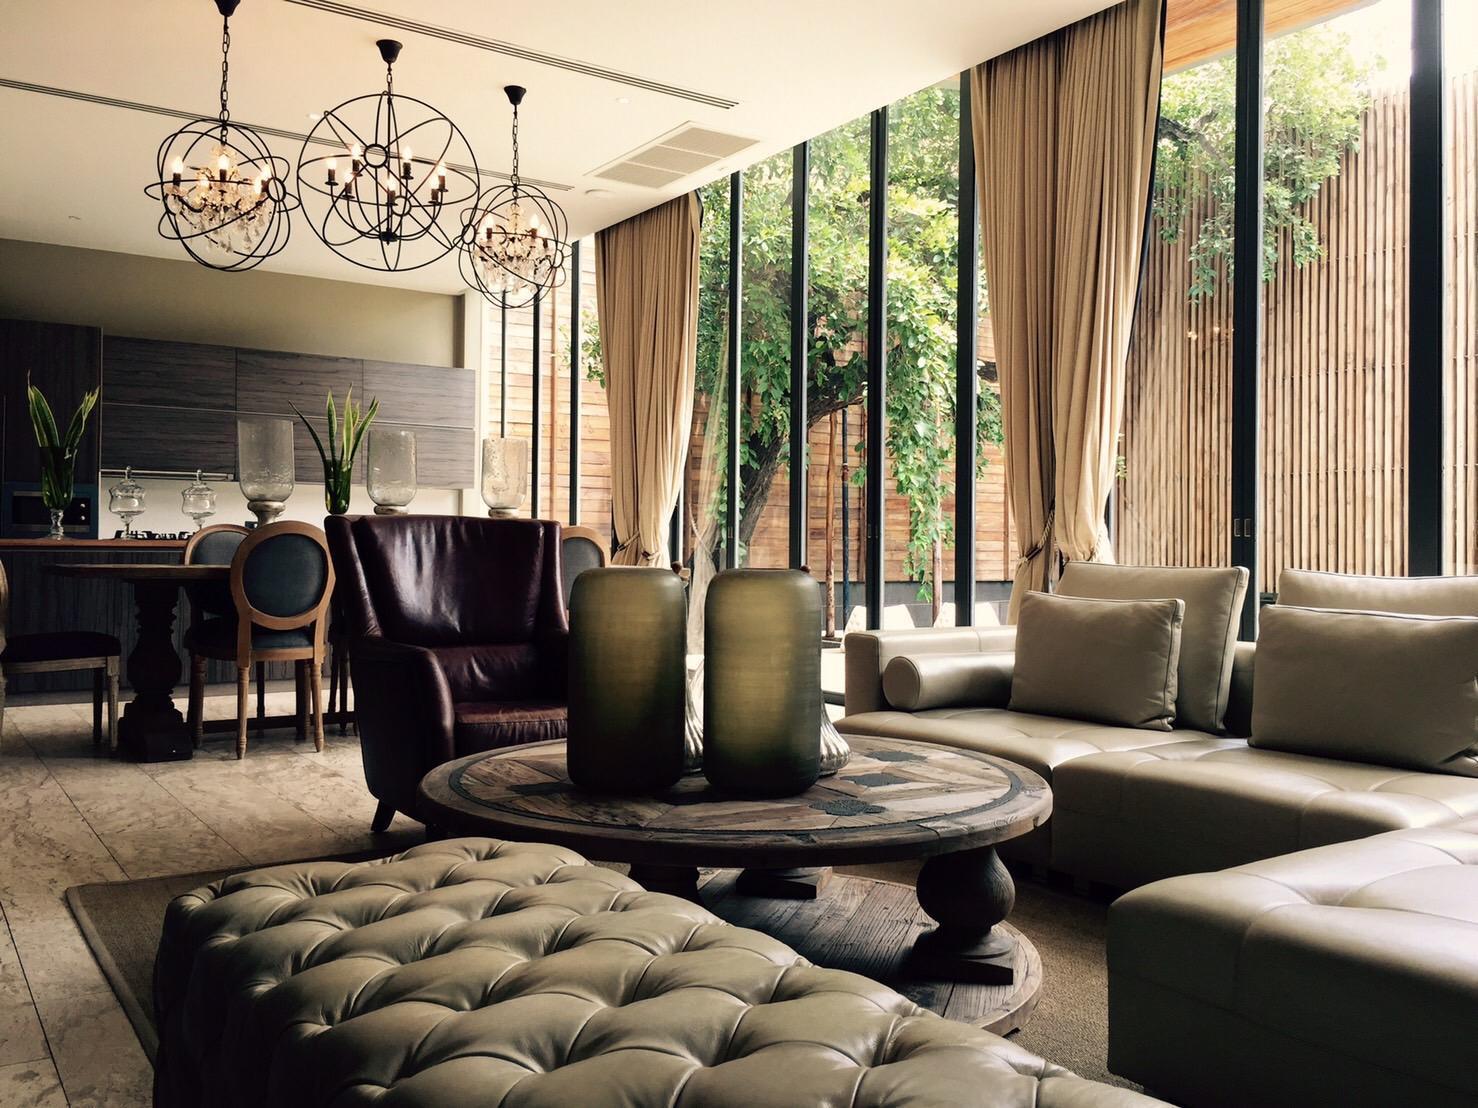 4Rooms 3FL Luxury Pool Villa @Central EastVille วิลลา 4 ห้องนอน 4 ห้องน้ำส่วนตัว ขนาด 505 ตร.ม. – รัชดาภิเษก